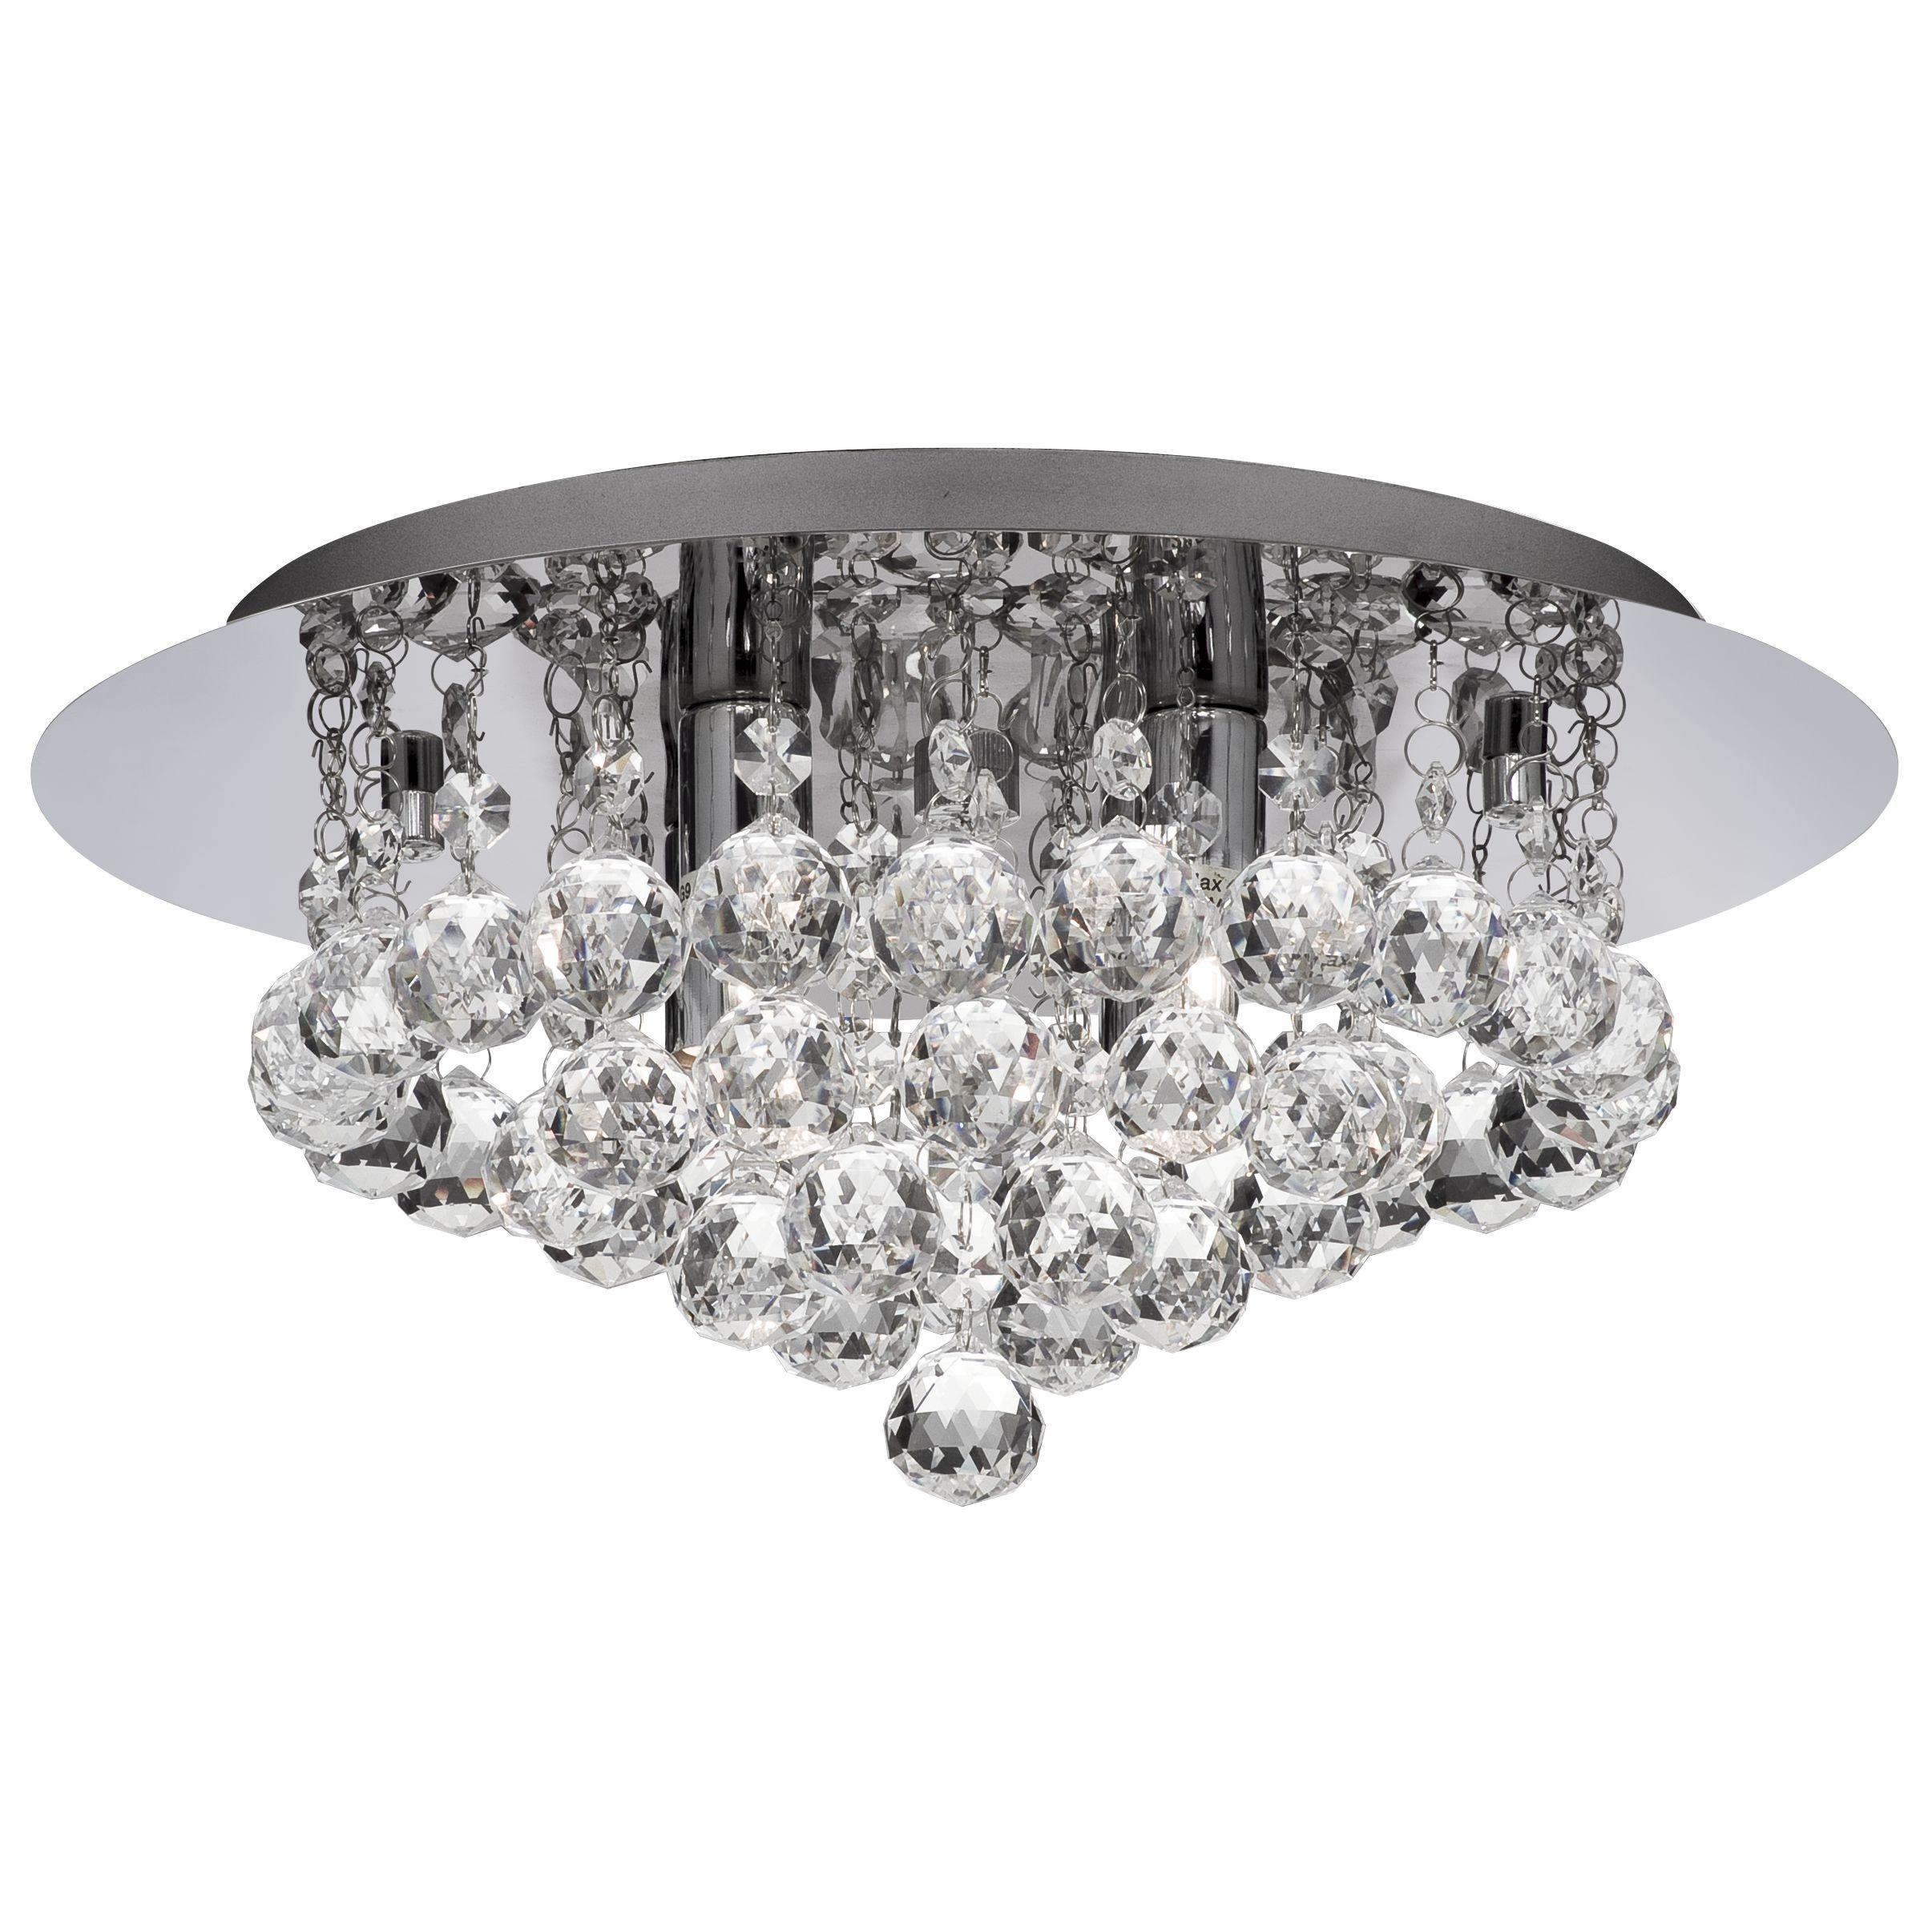 Hanna Chrome 4 Light Semi-flush With Clear Crystal Balls Fitting